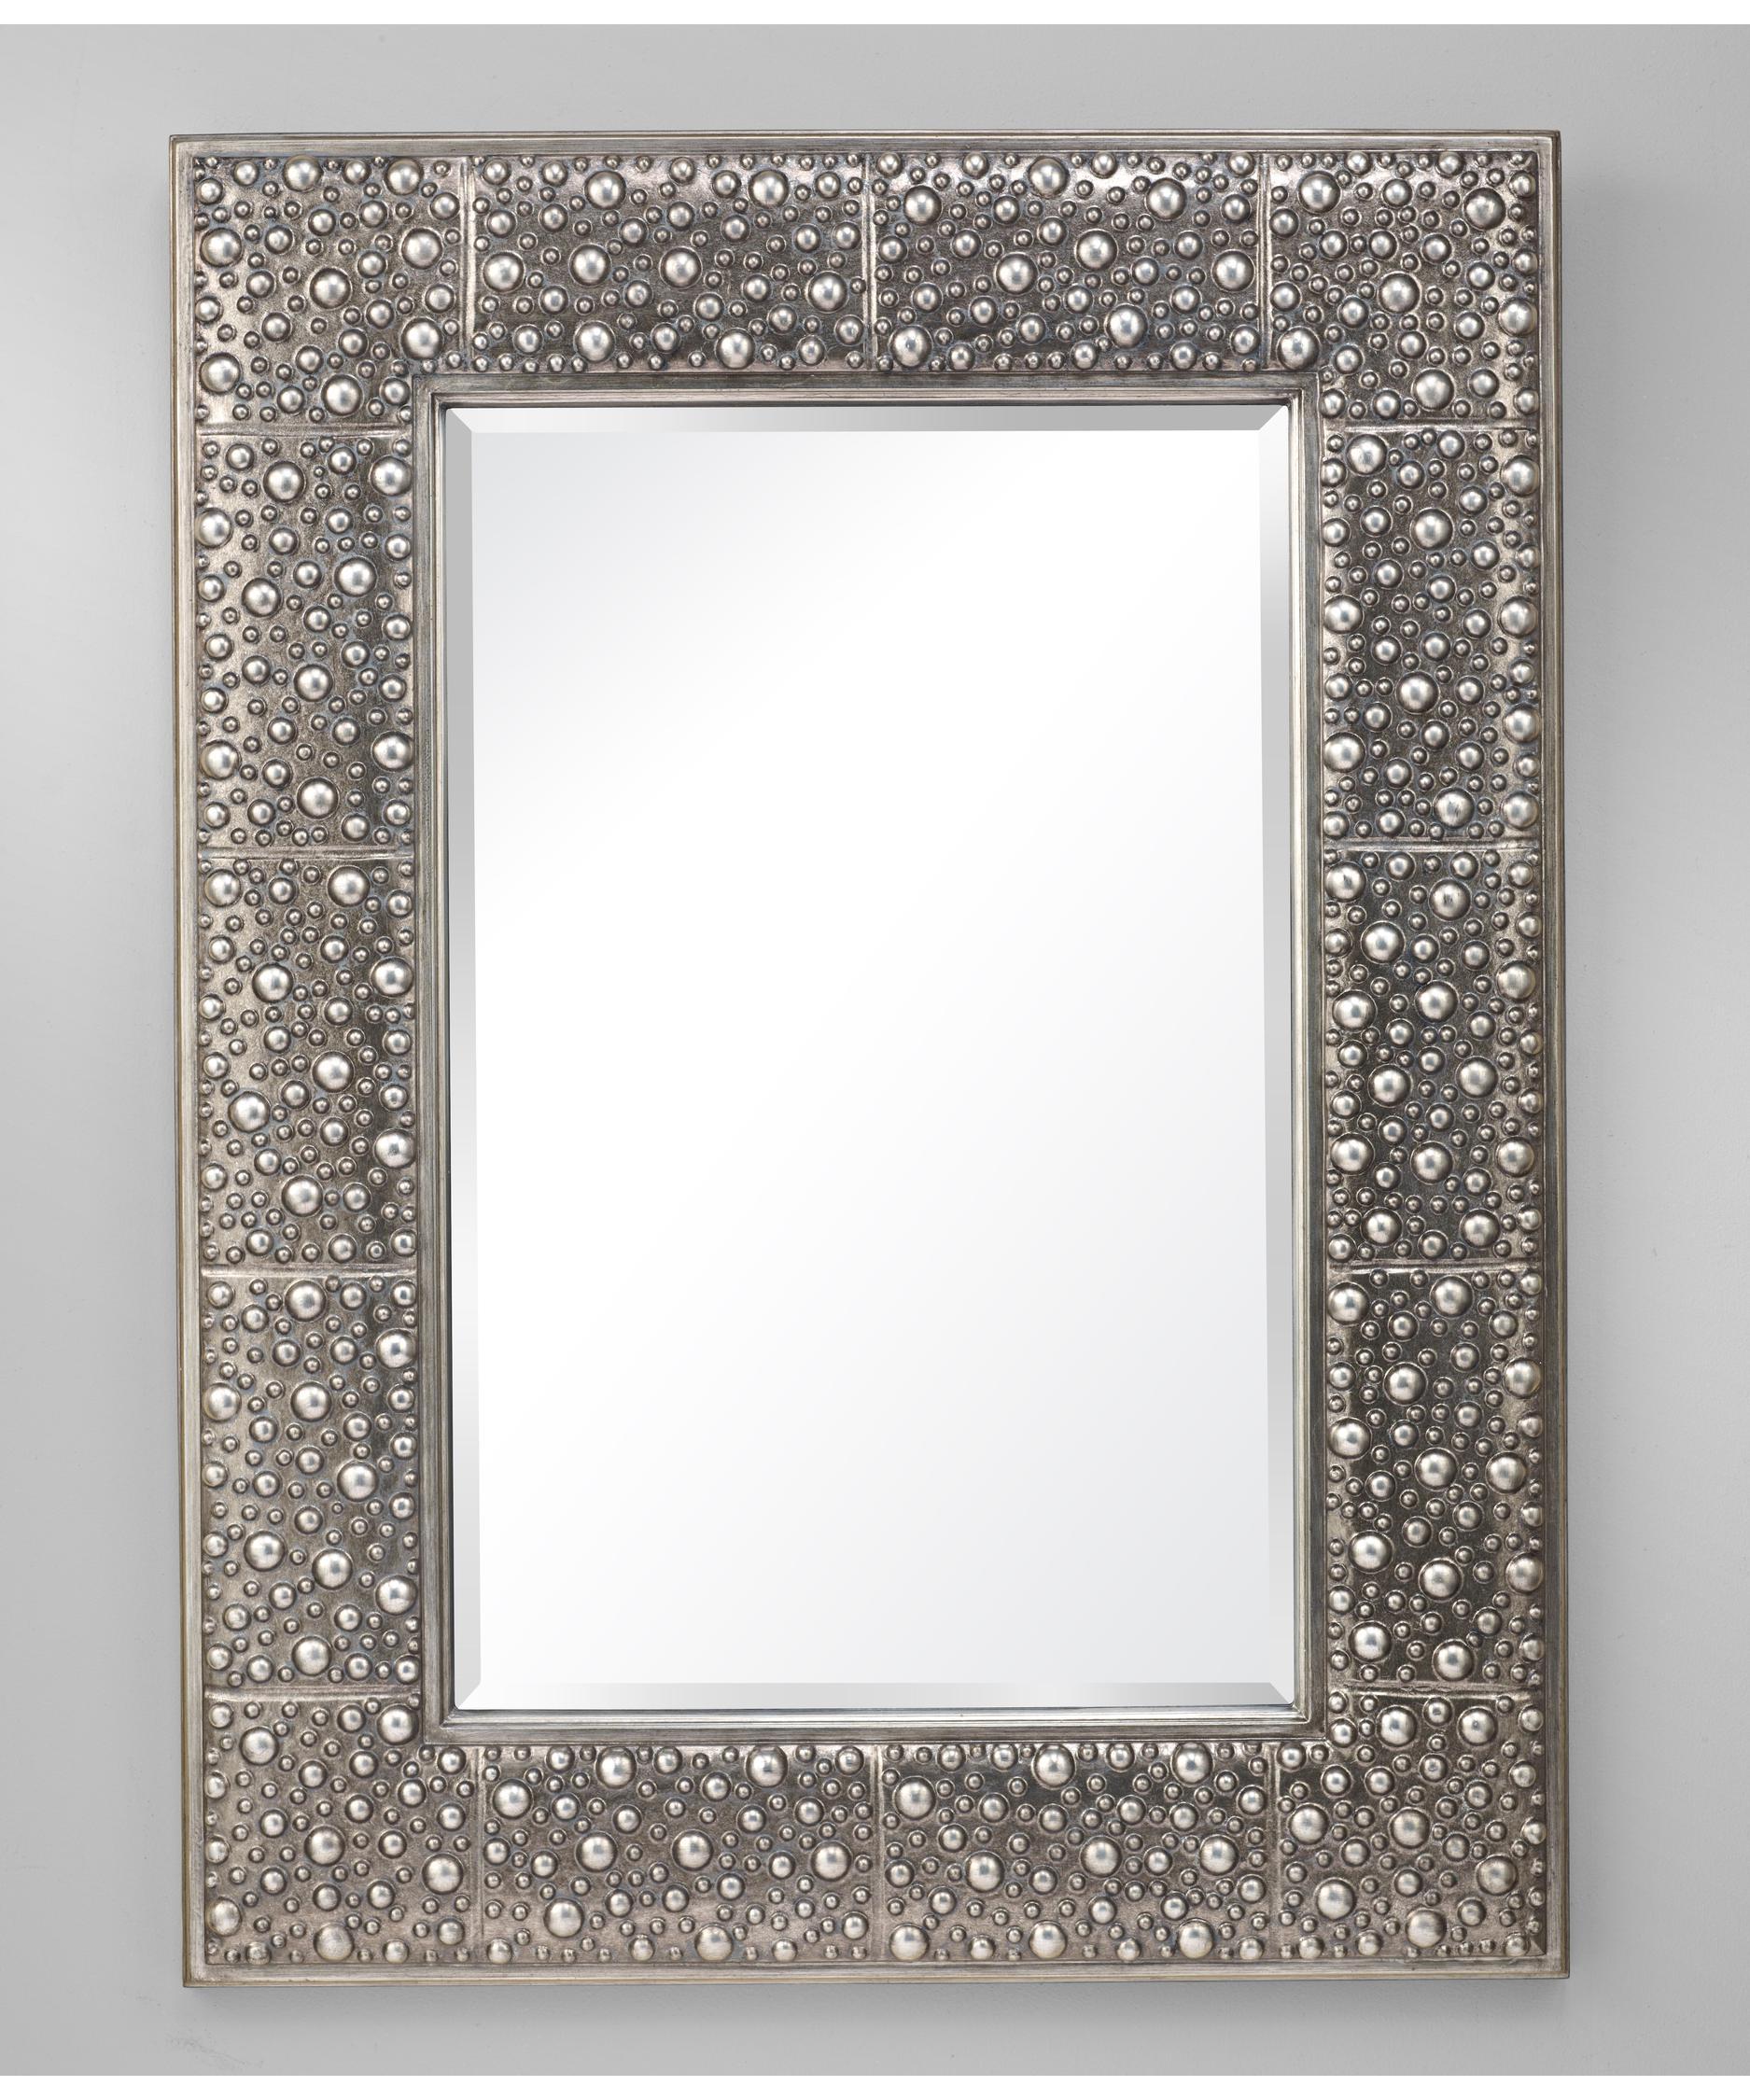 Murray Feiss Mirrors: Murray Feiss MR1175 Danby Rectangular Wall Mirror